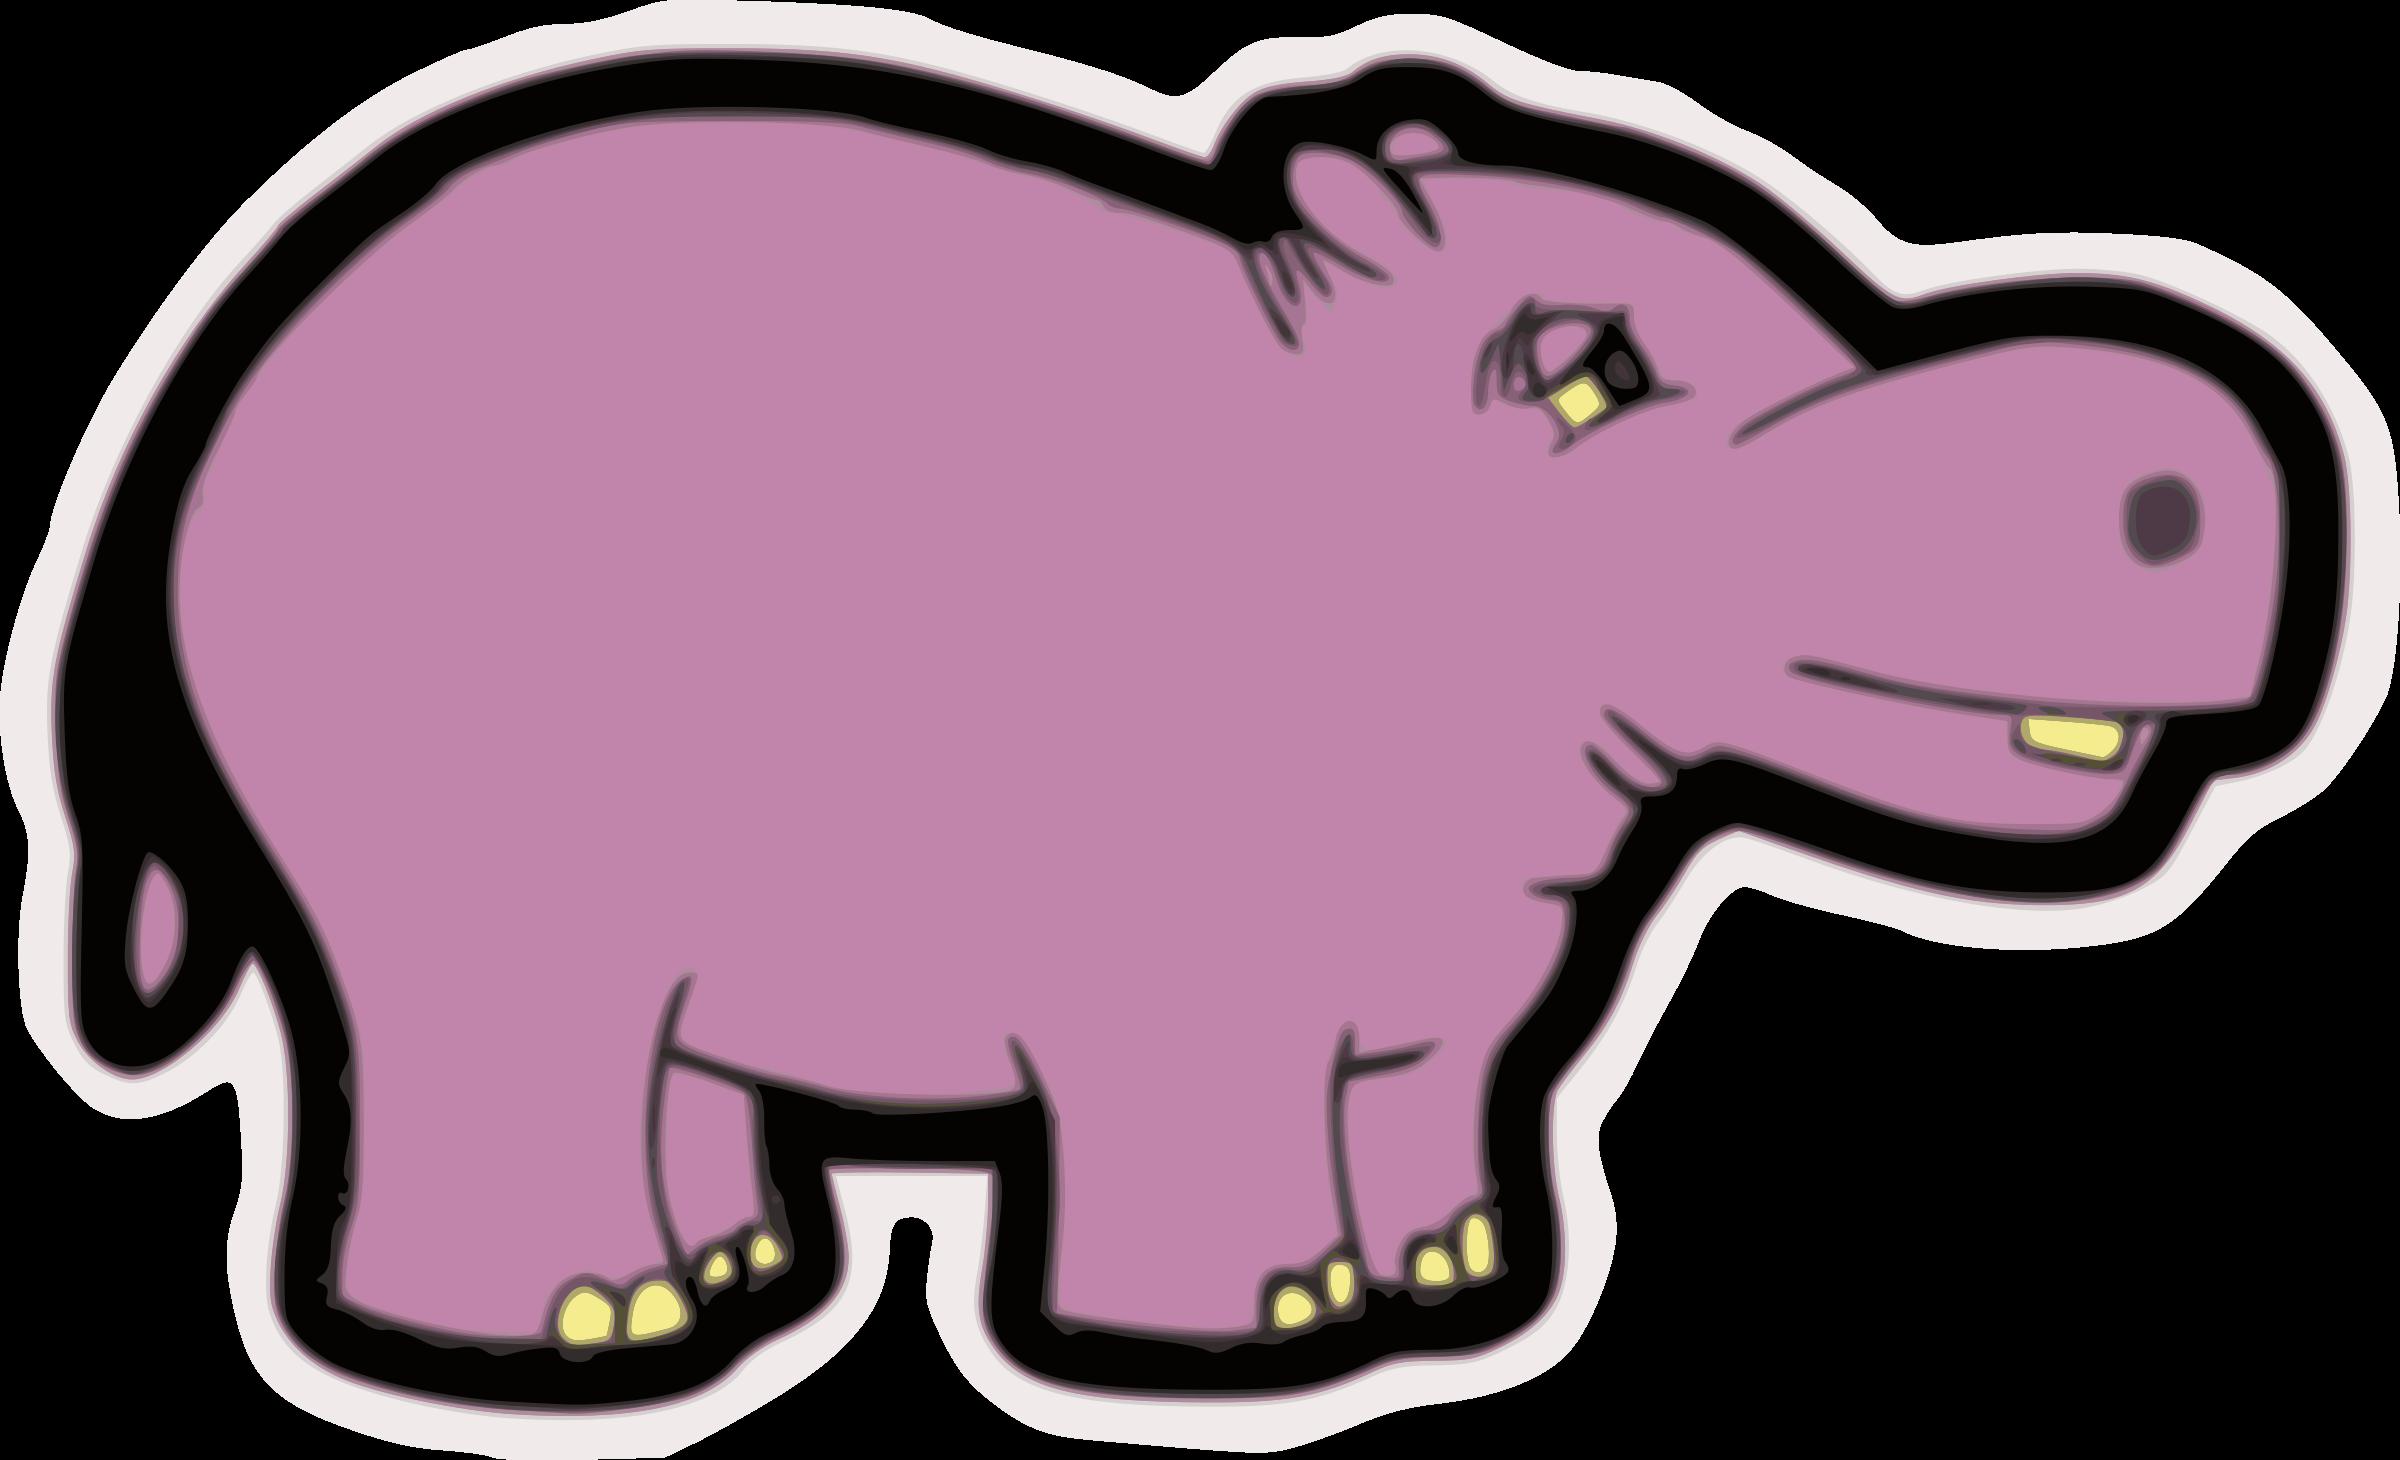 Hippopotamus clipart purple. Hippo big image png